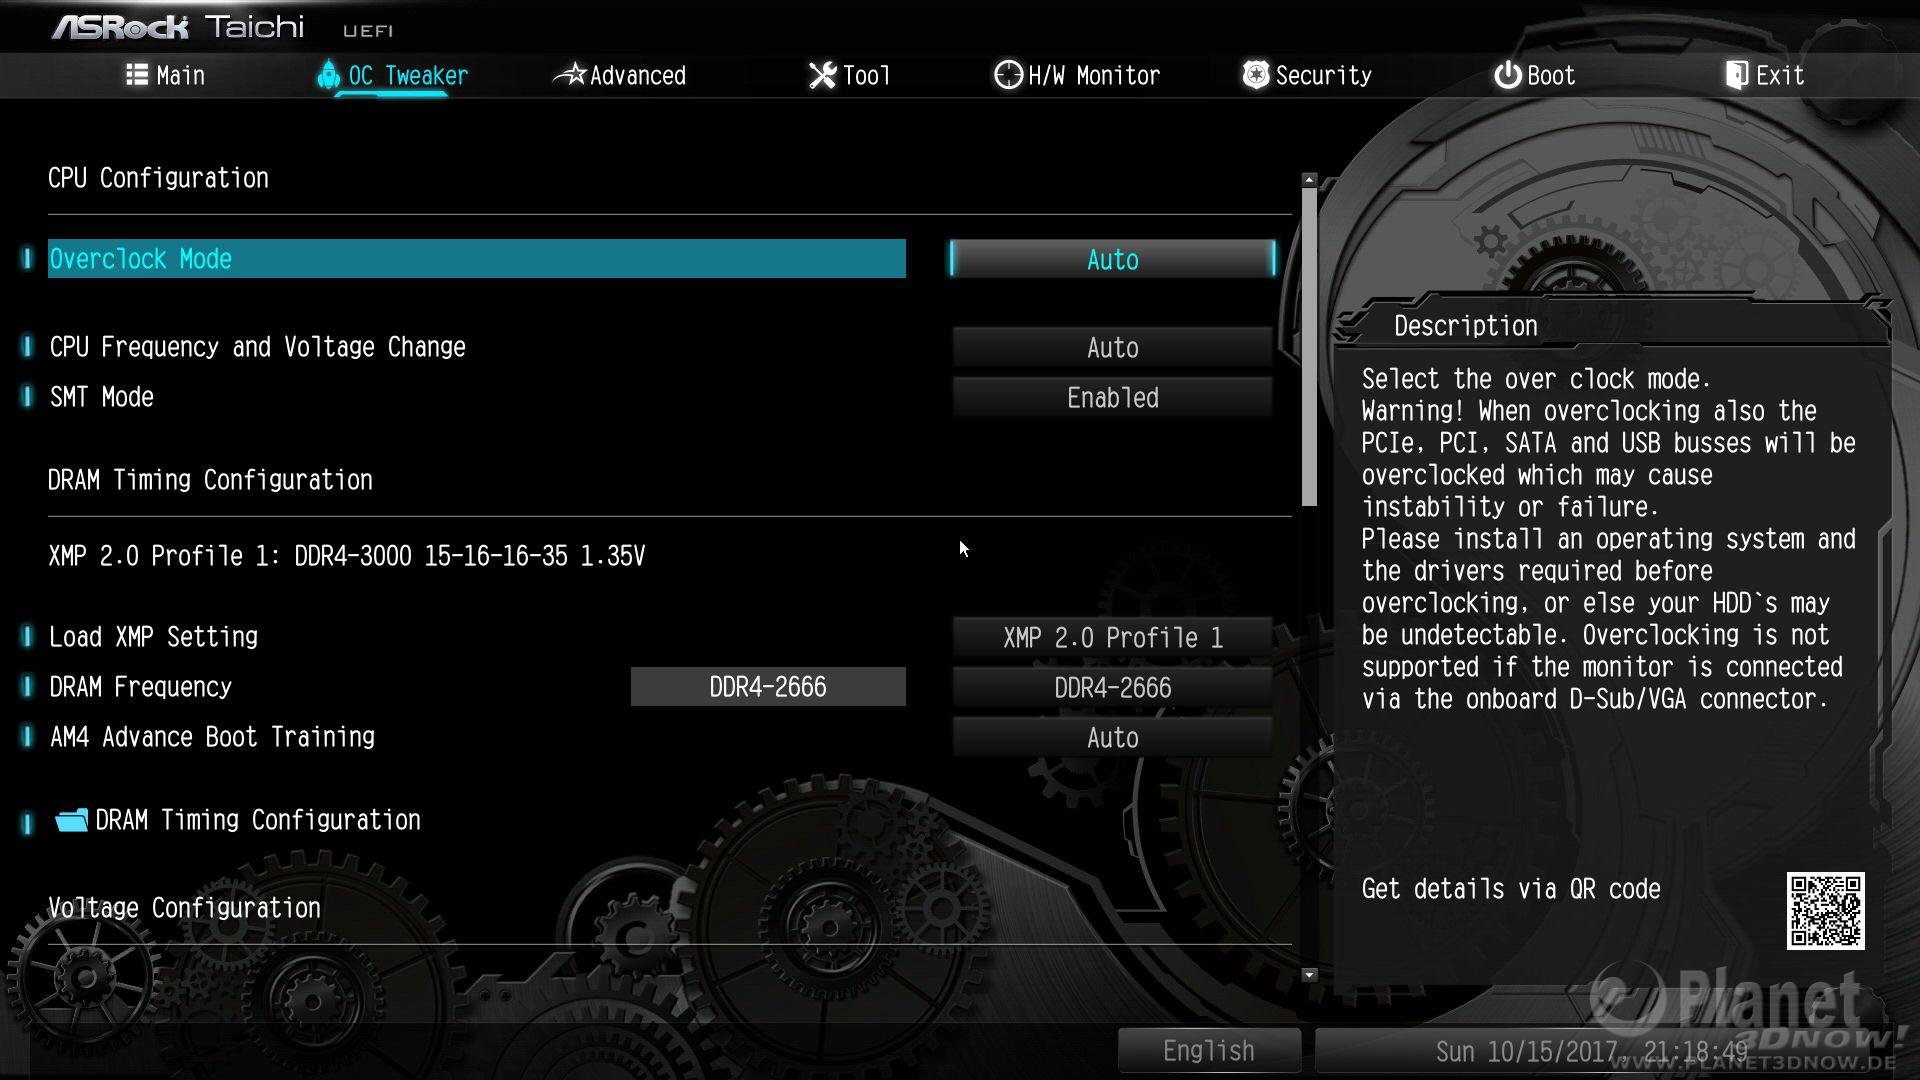 ASRock X370 Taichi - BIOS